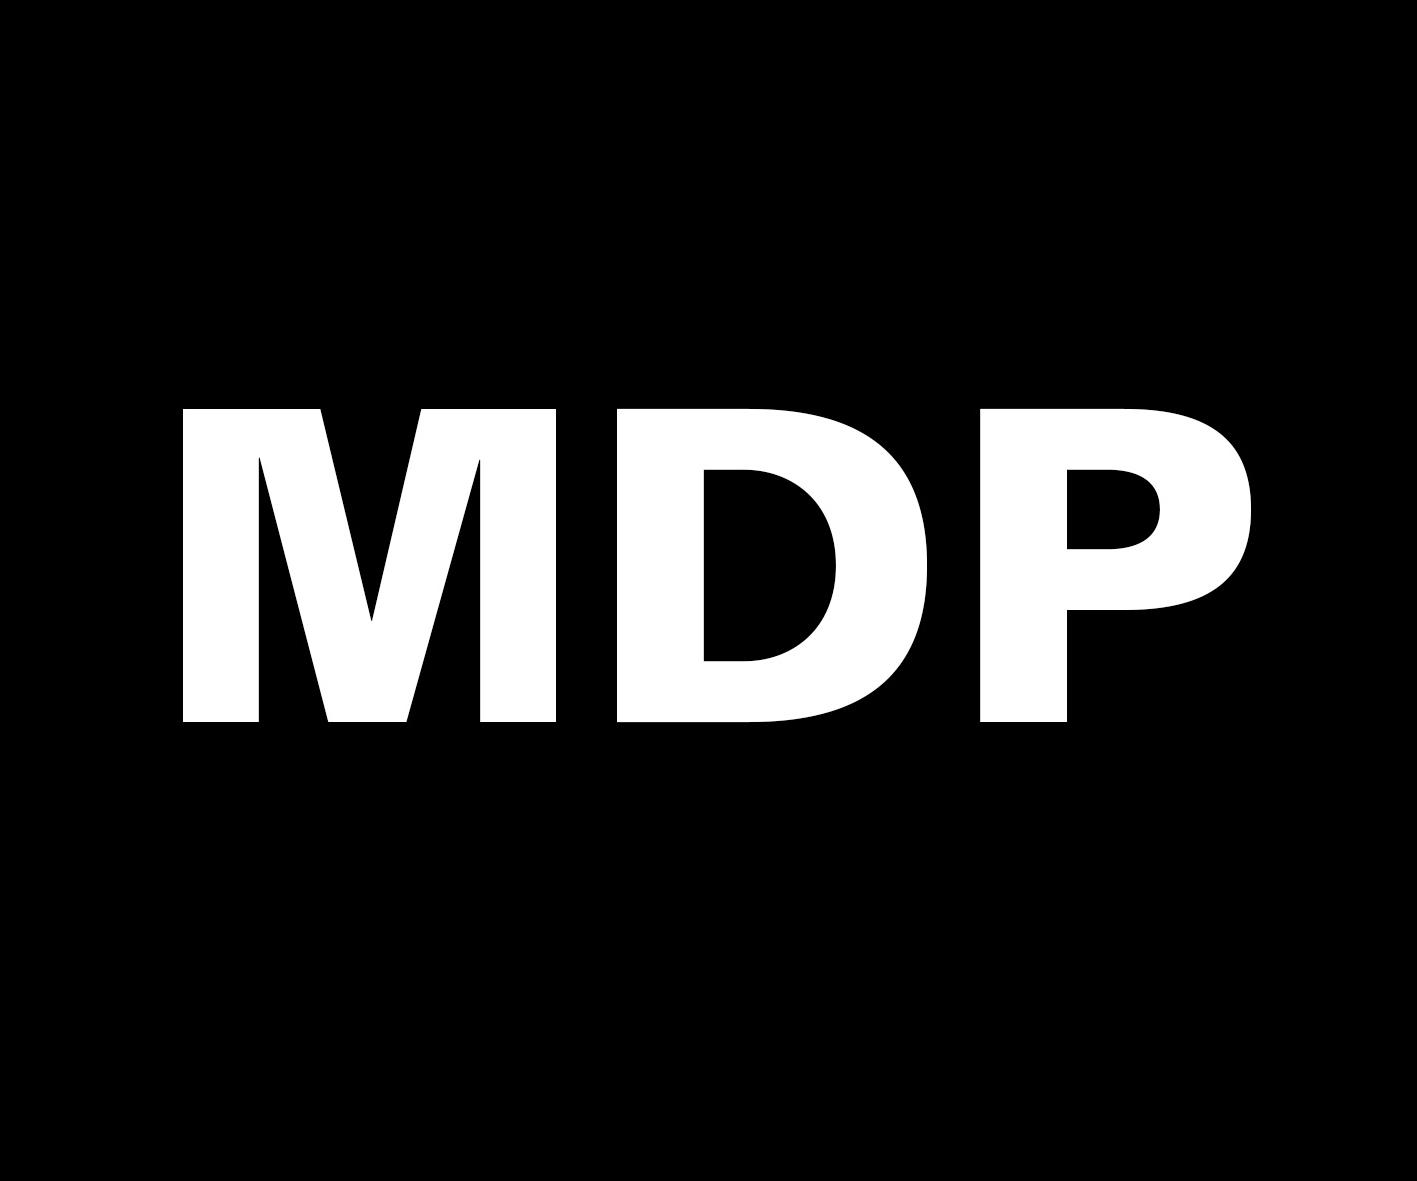 Moby-Dick Project / Laboratoire des objets libres